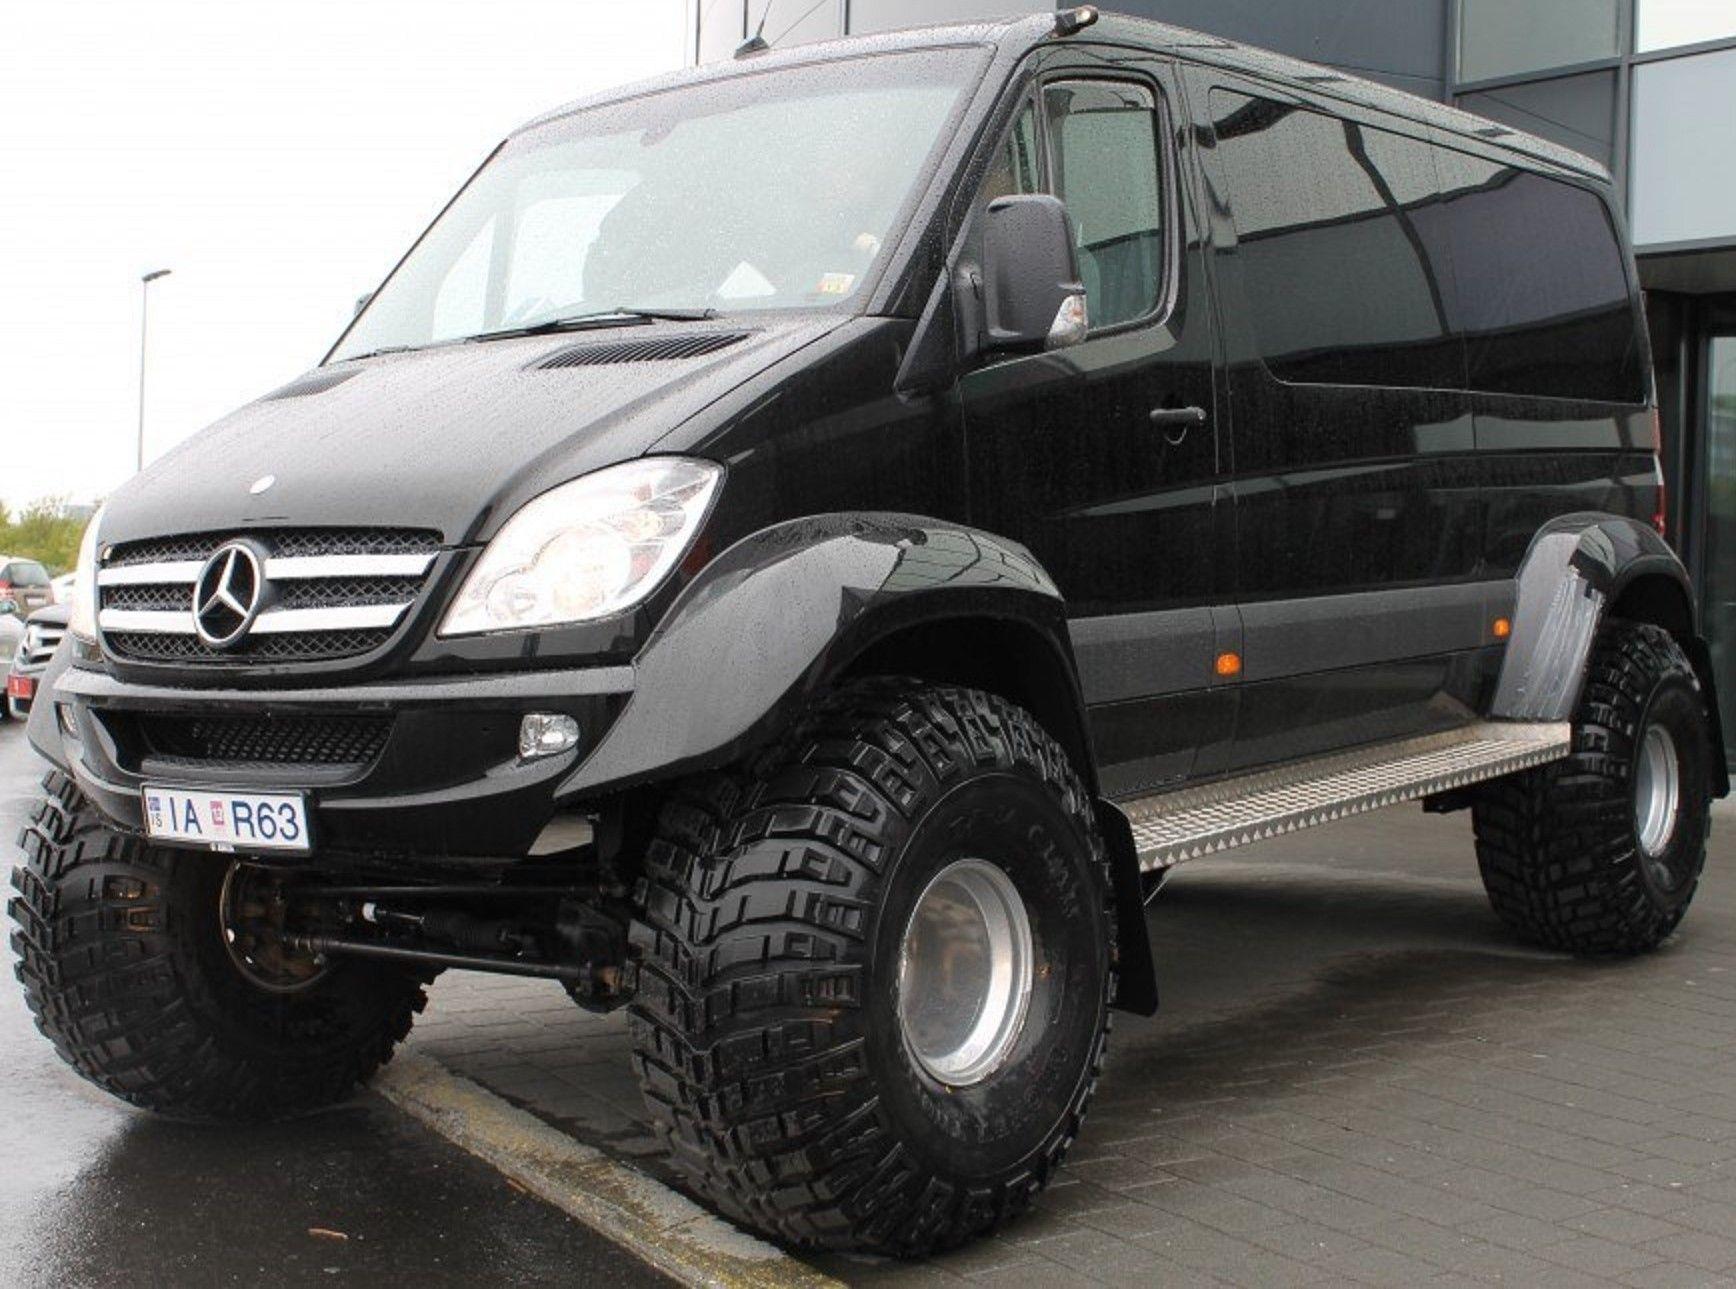 MercedesBenz OffRoad 4x4 Icelandic Sprinter. http